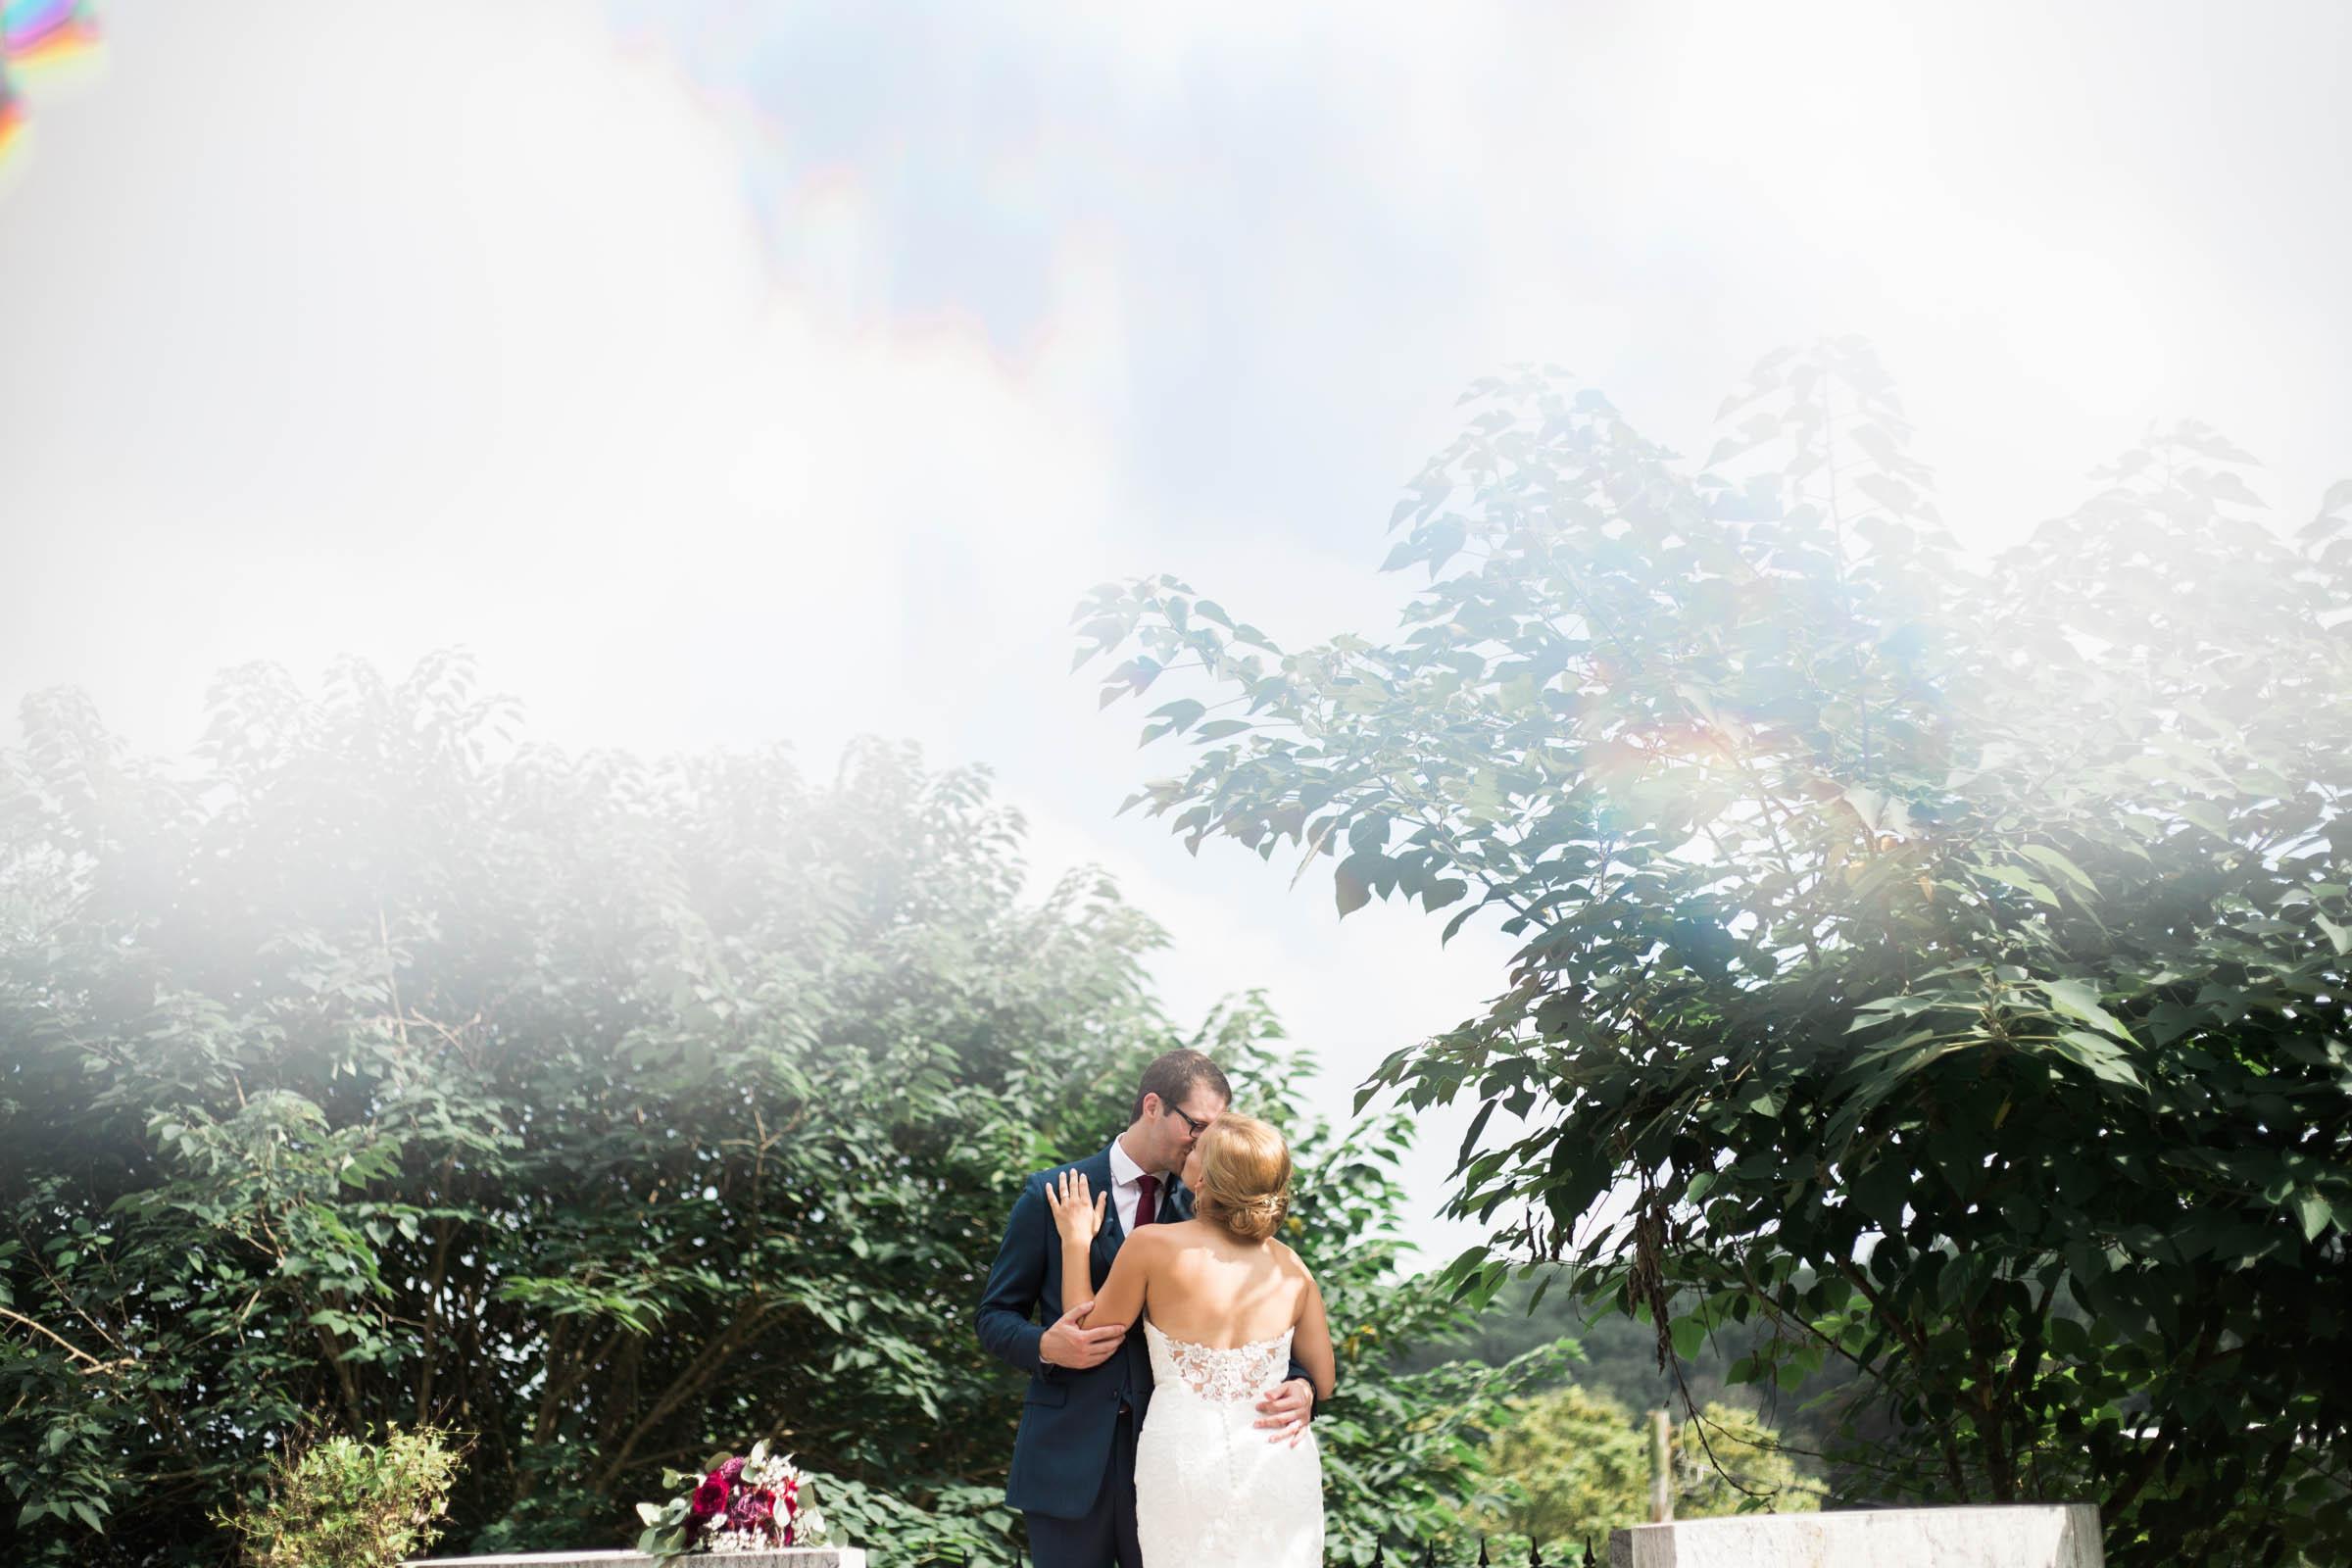 Ellicott City Wedding Photography by Megapixels Media Top Maryland Wedding Photographer magical bridal portrait.jpg